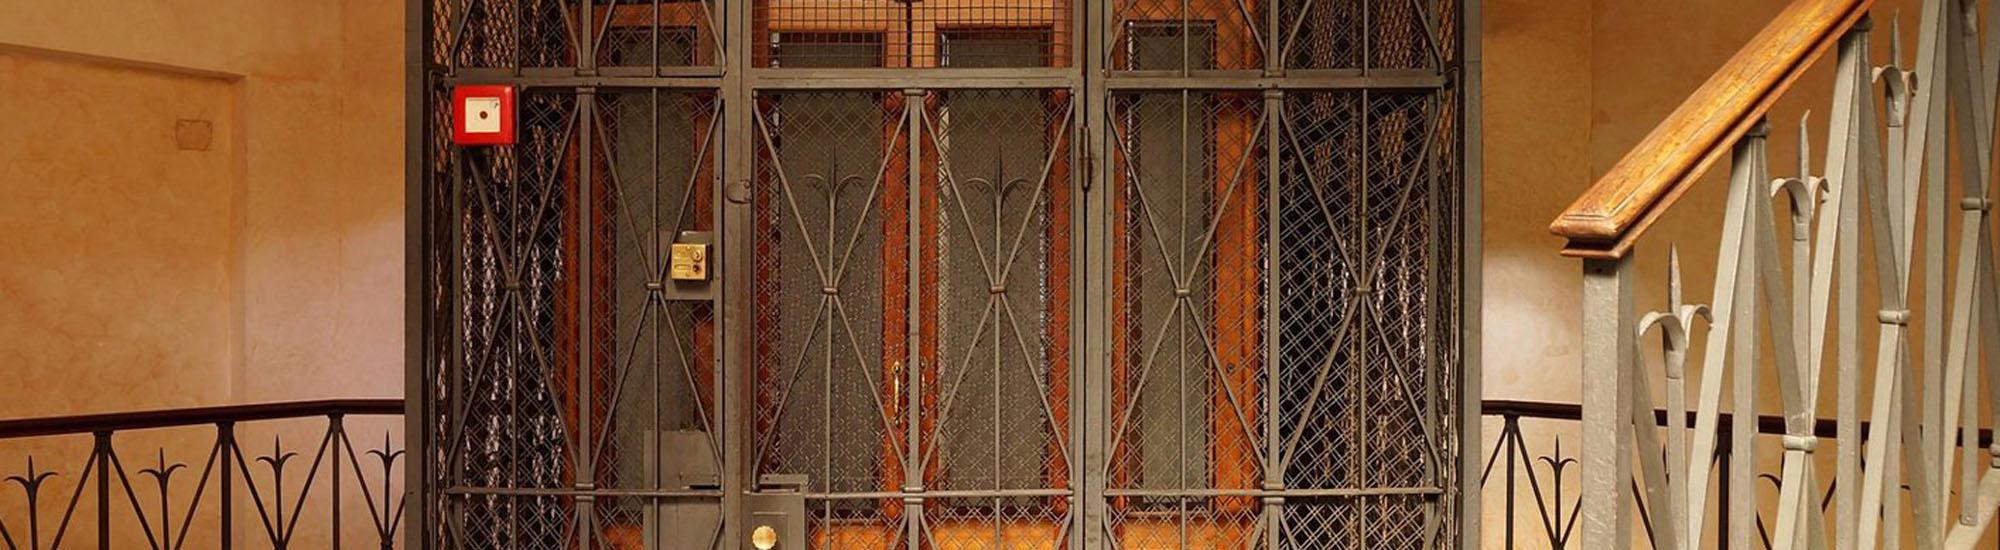 manutenzione assistenza ascensori savona